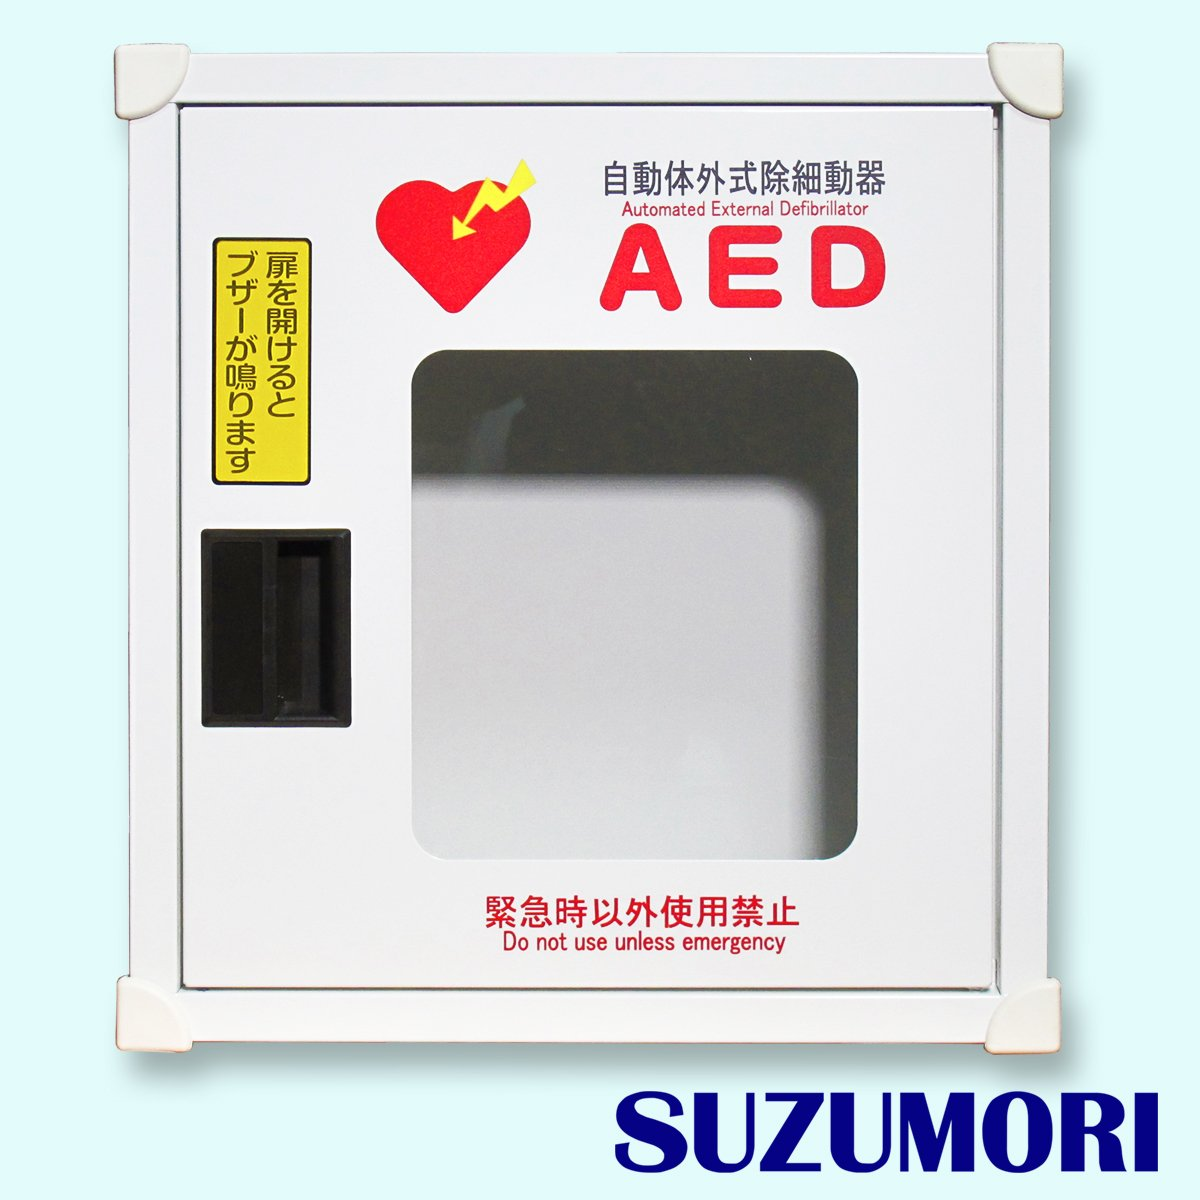 AED収納ボックス JYO-CN61 ブザー付き 【壁面設置タイプ】 B075JC4DMG